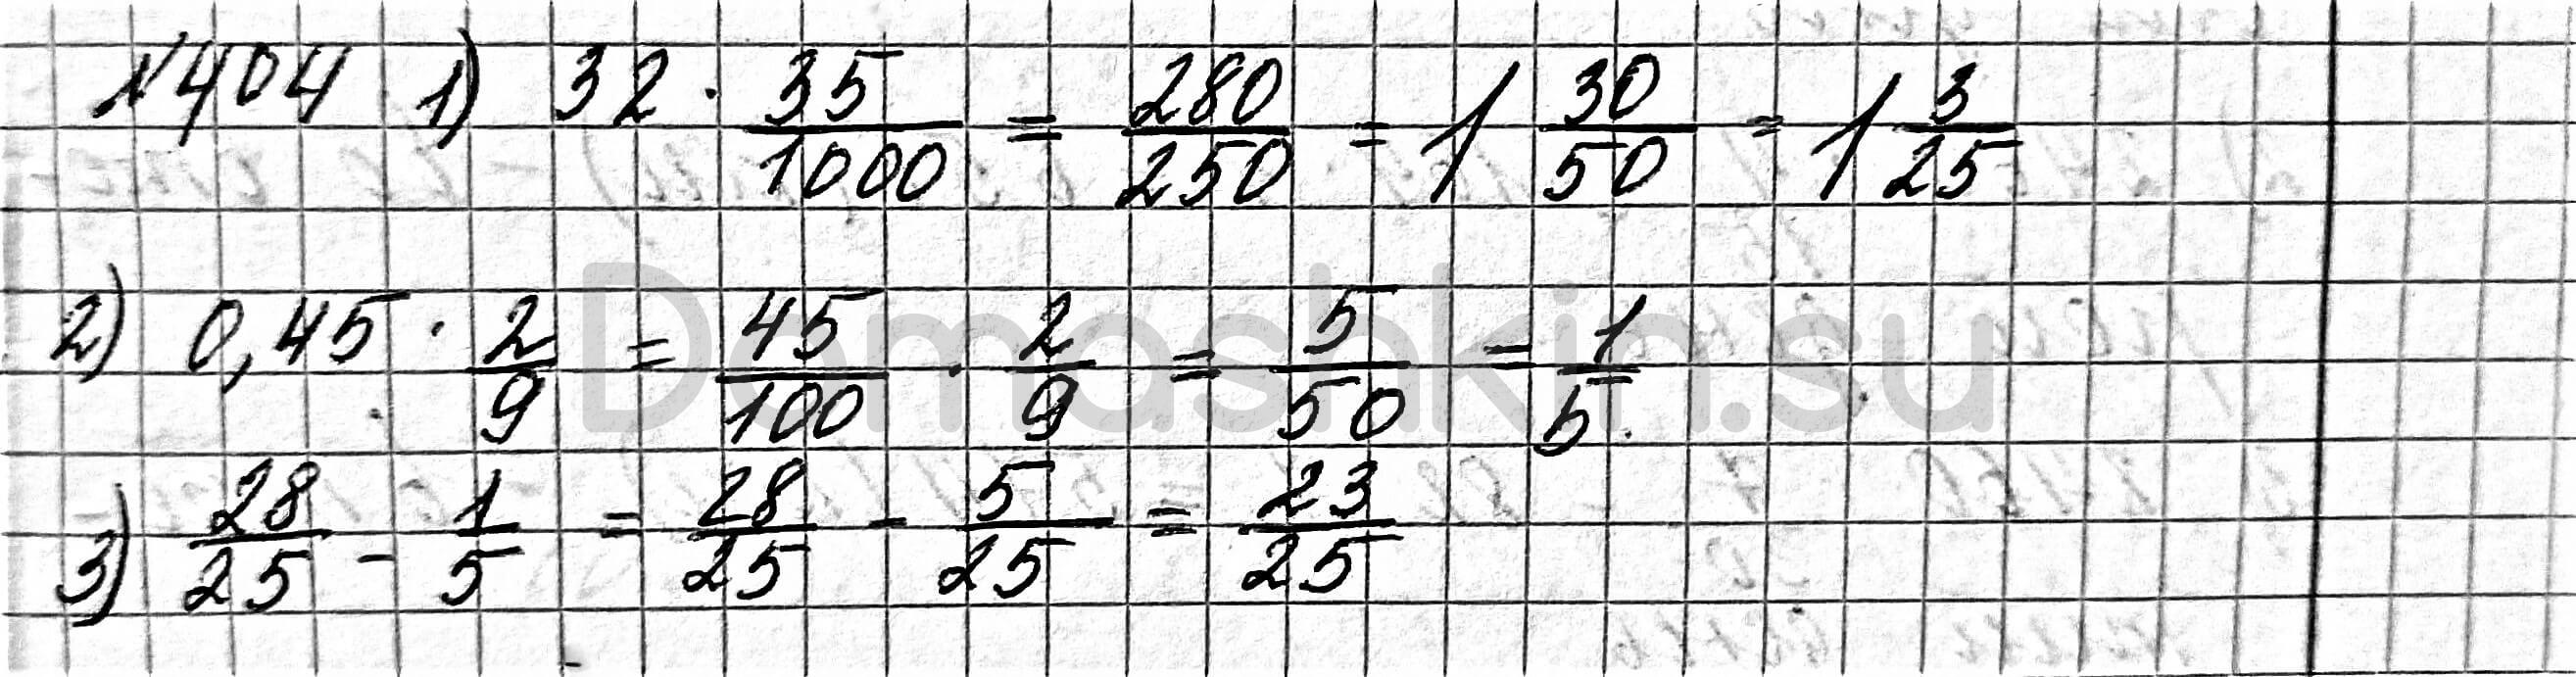 Математика 6 класс учебник Мерзляк номер 404 решение